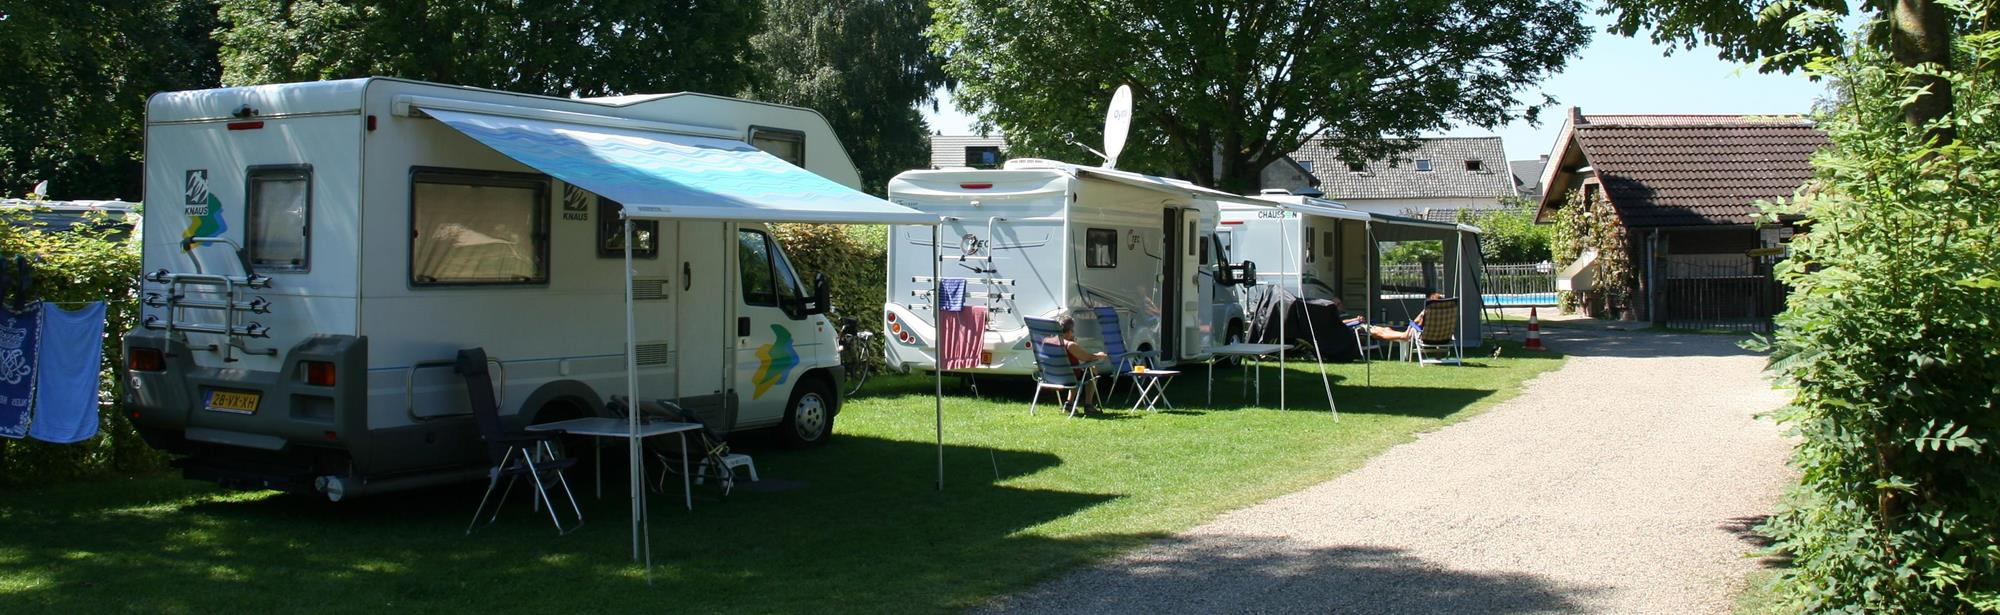 Camping de Linde